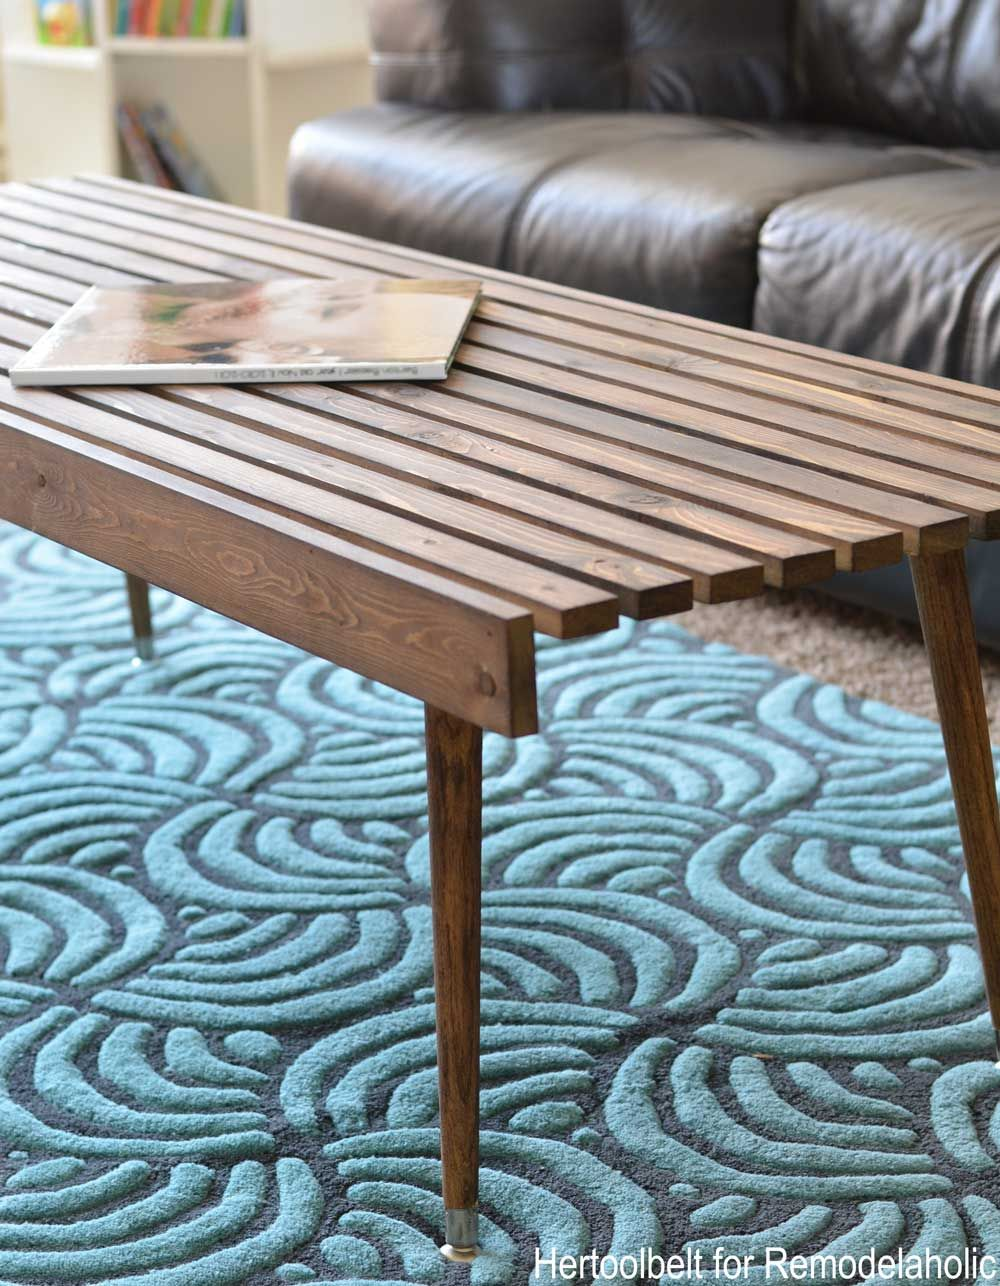 Diy Modern Coffee Table Side Close Up Diy Coffee Table Coffee Table Modern Diy [ 1286 x 1000 Pixel ]